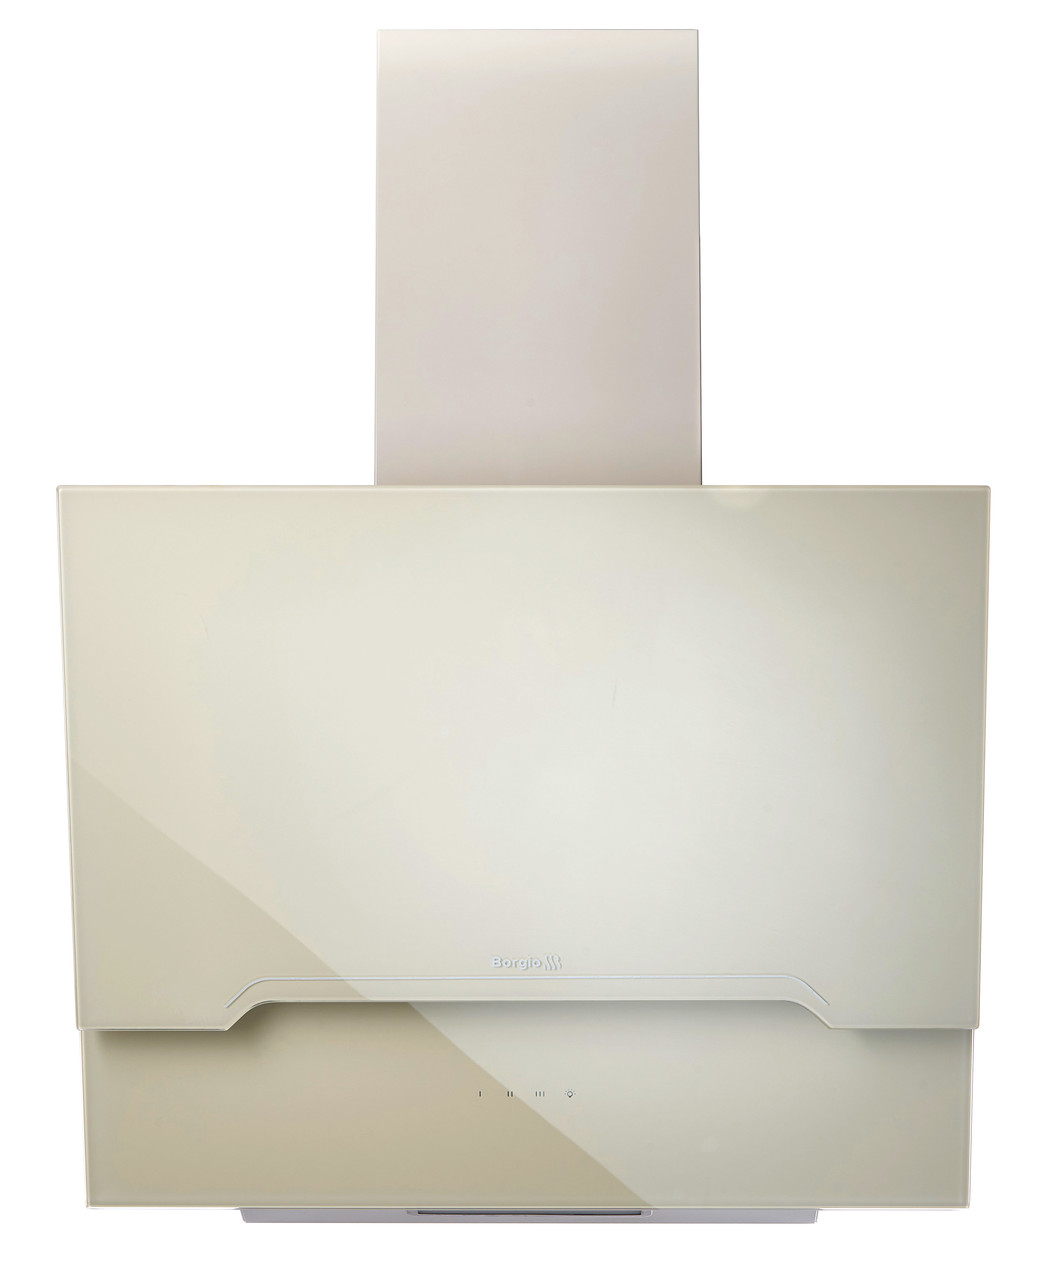 Кухонна витяжка похила BORGIO RNT-RS 60 ivory SU (1000 м/куб)